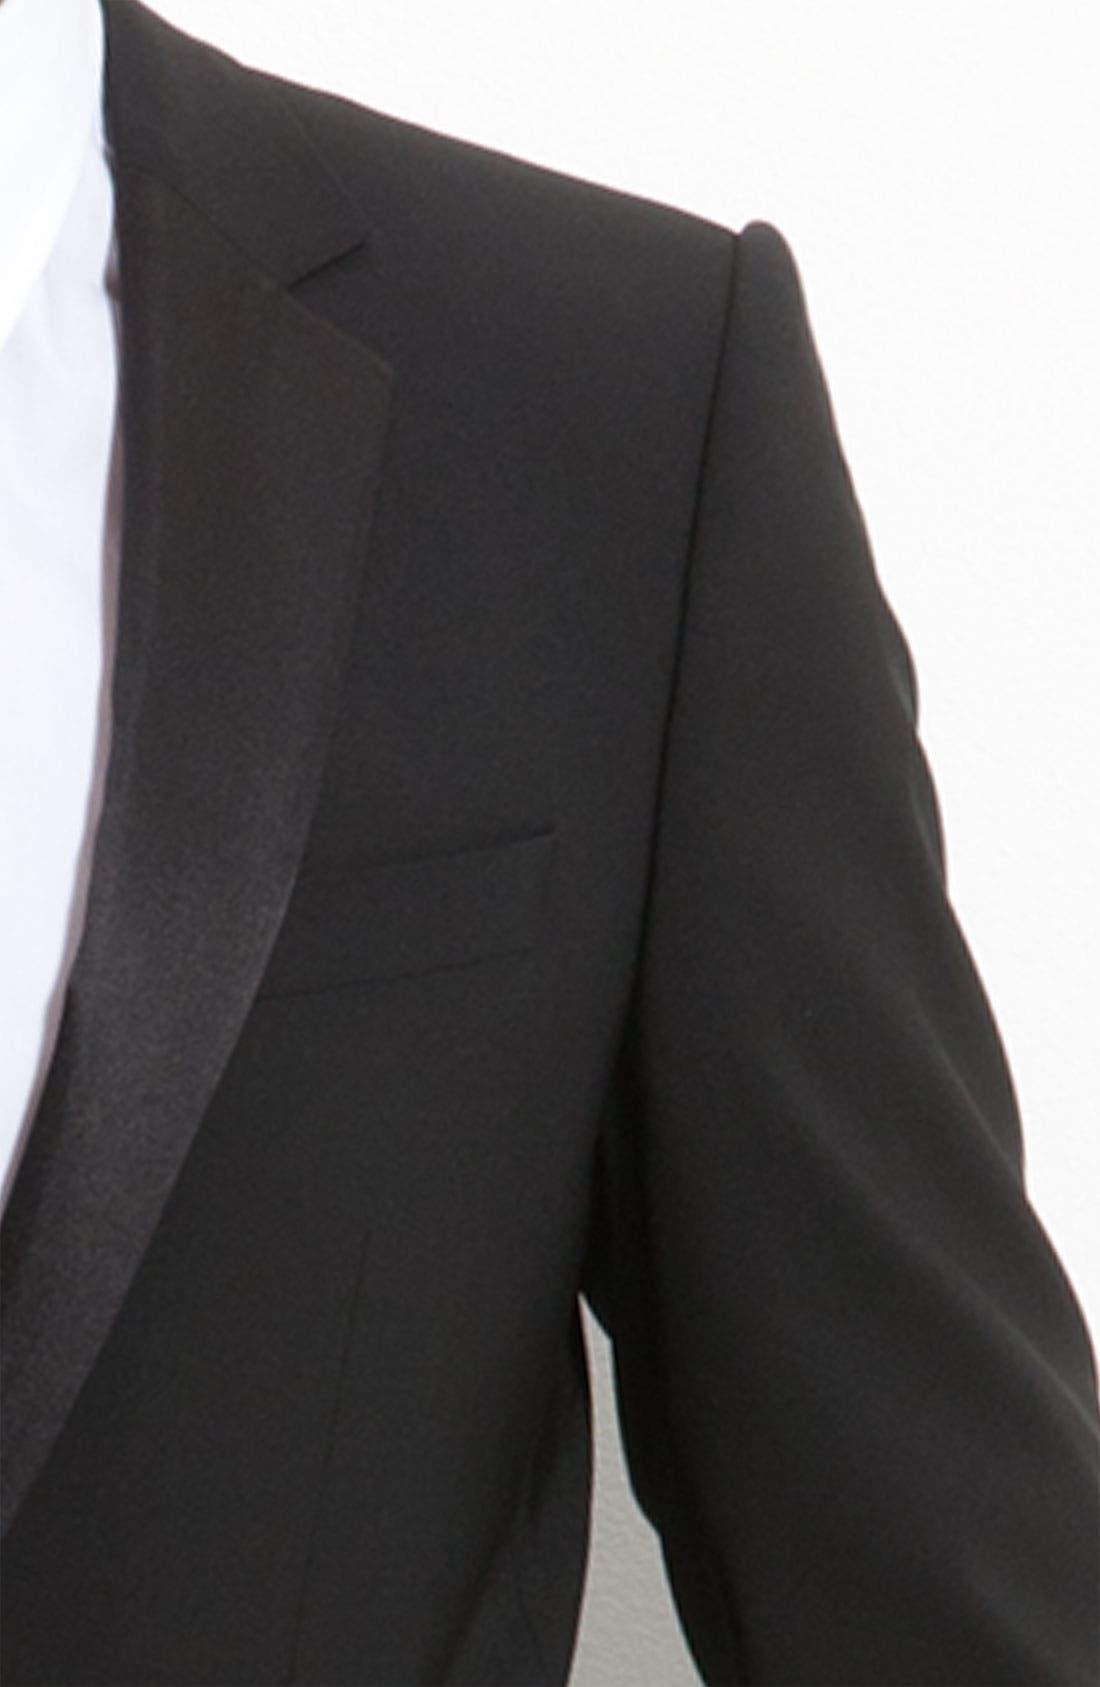 Alternate Image 3  - HUGO 'Aikin Hollo' Trim Fit Wool Tuxedo